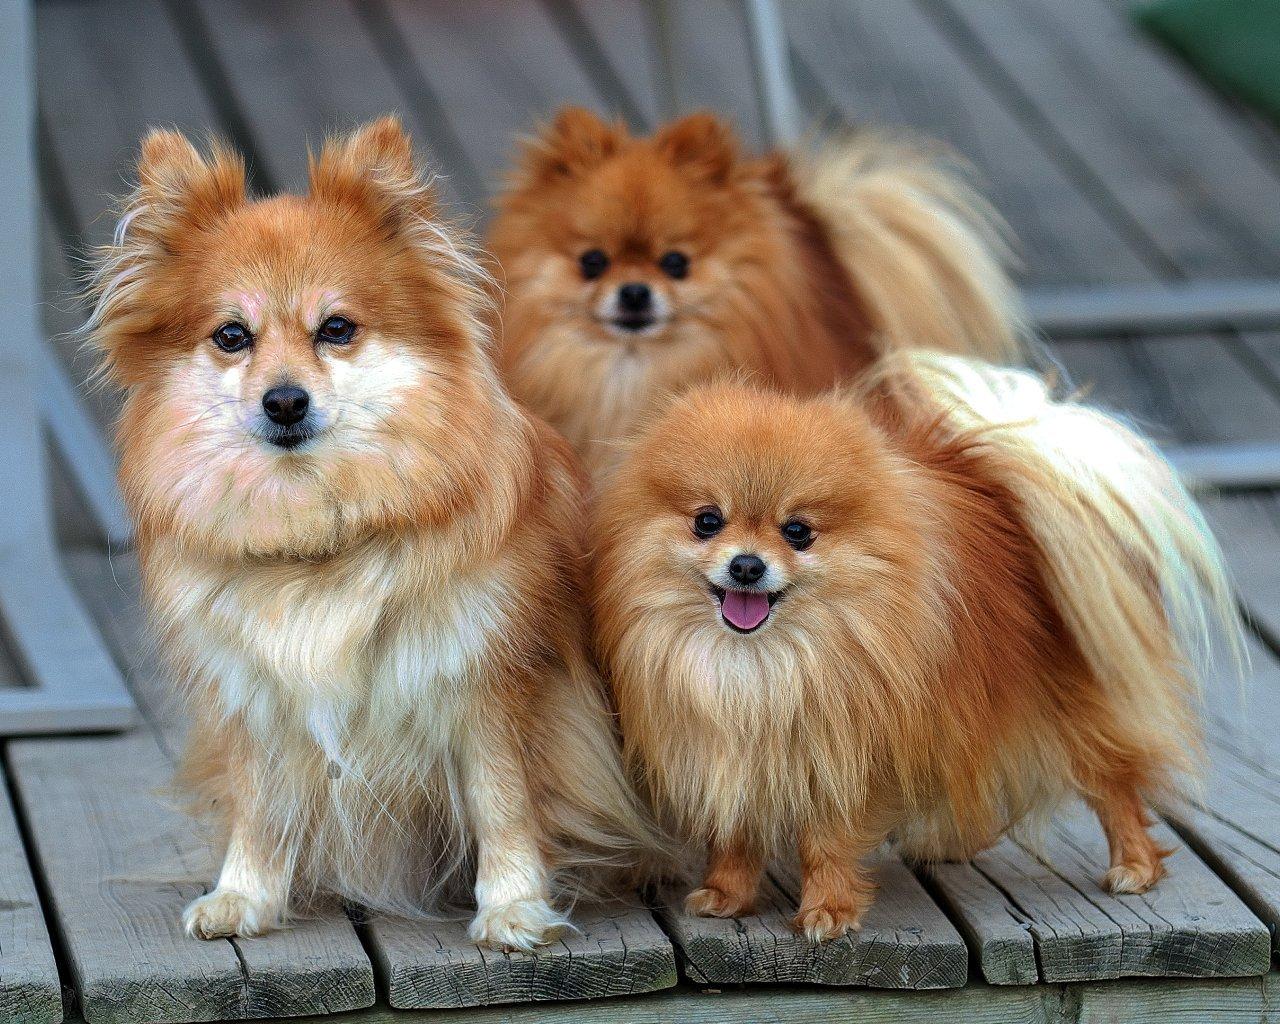 Pomeranians images pomeranian hd wallpaper and background photos - Alimentos Para Perros Pomeranian Spitz Puppies